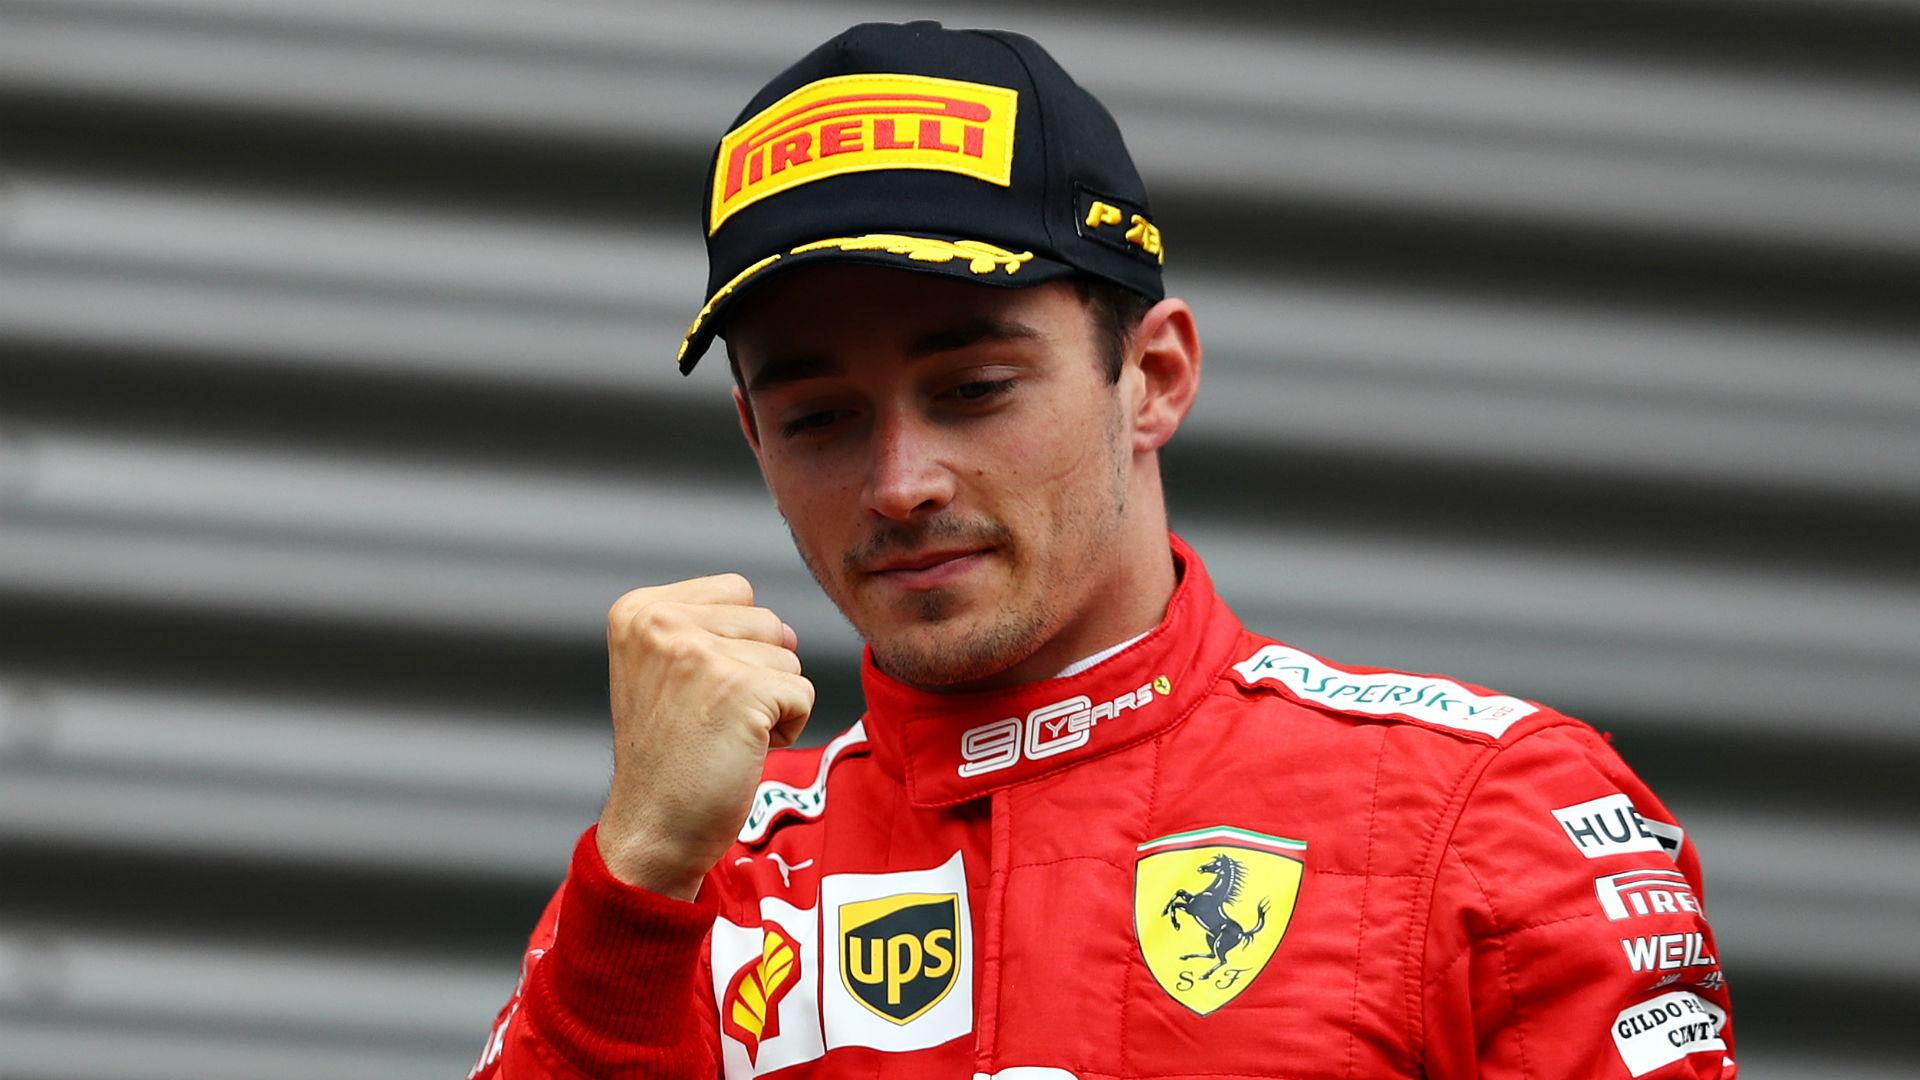 F1 Raceweek: Ferrari seek home win at Monza - Italian GP in numbers